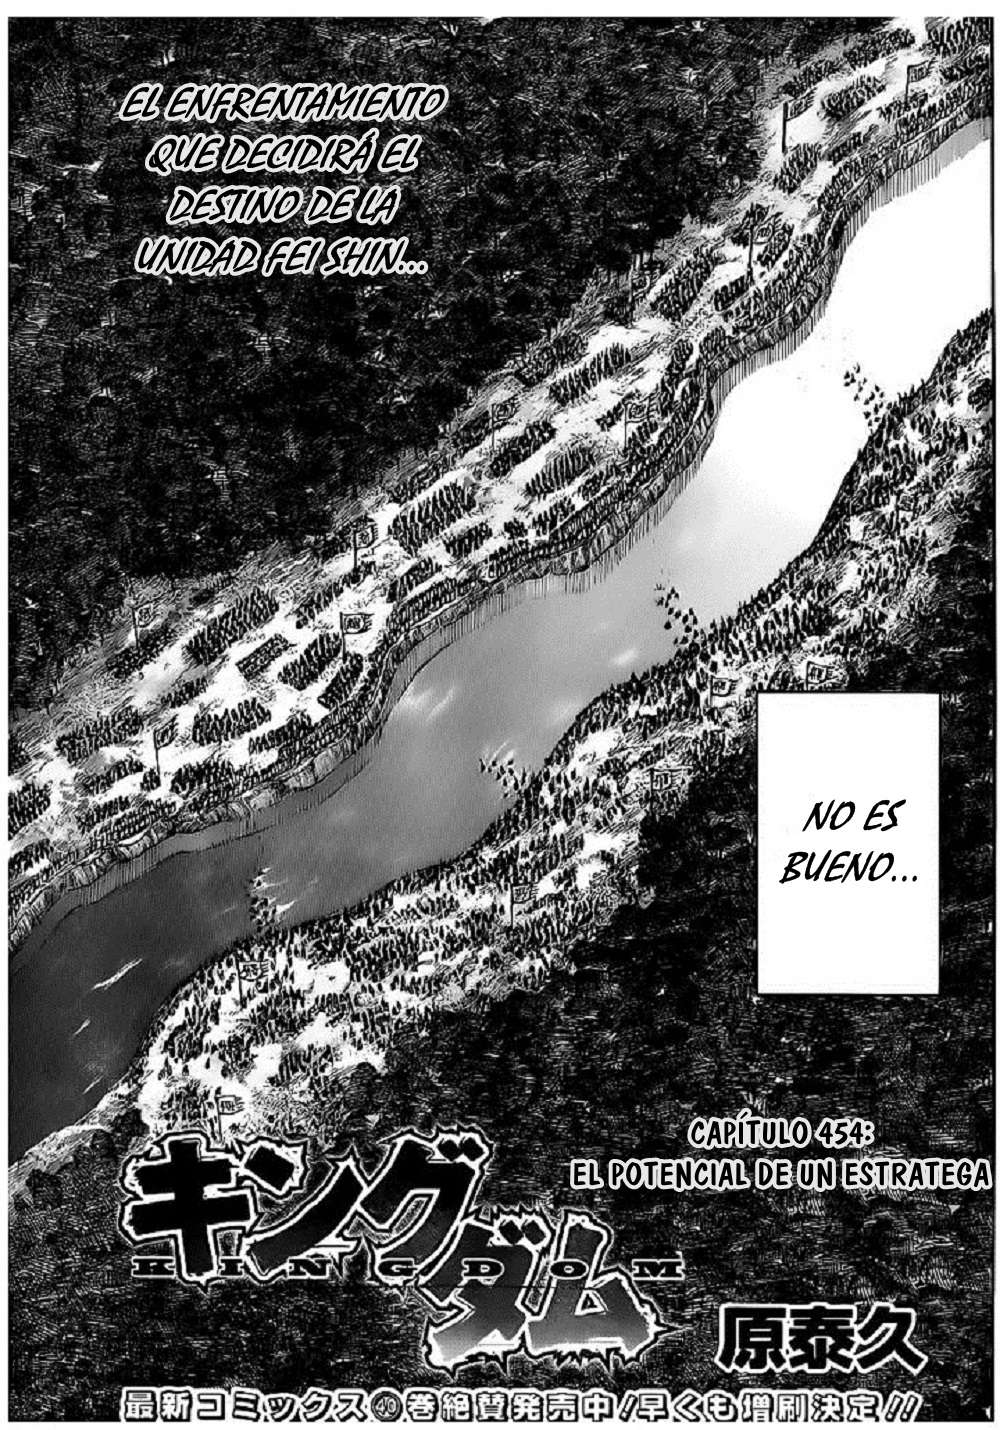 http://c5.ninemanga.com/es_manga/19/12307/431197/535b8a7c260ccef00aa9ac0ecde6067f.jpg Page 4